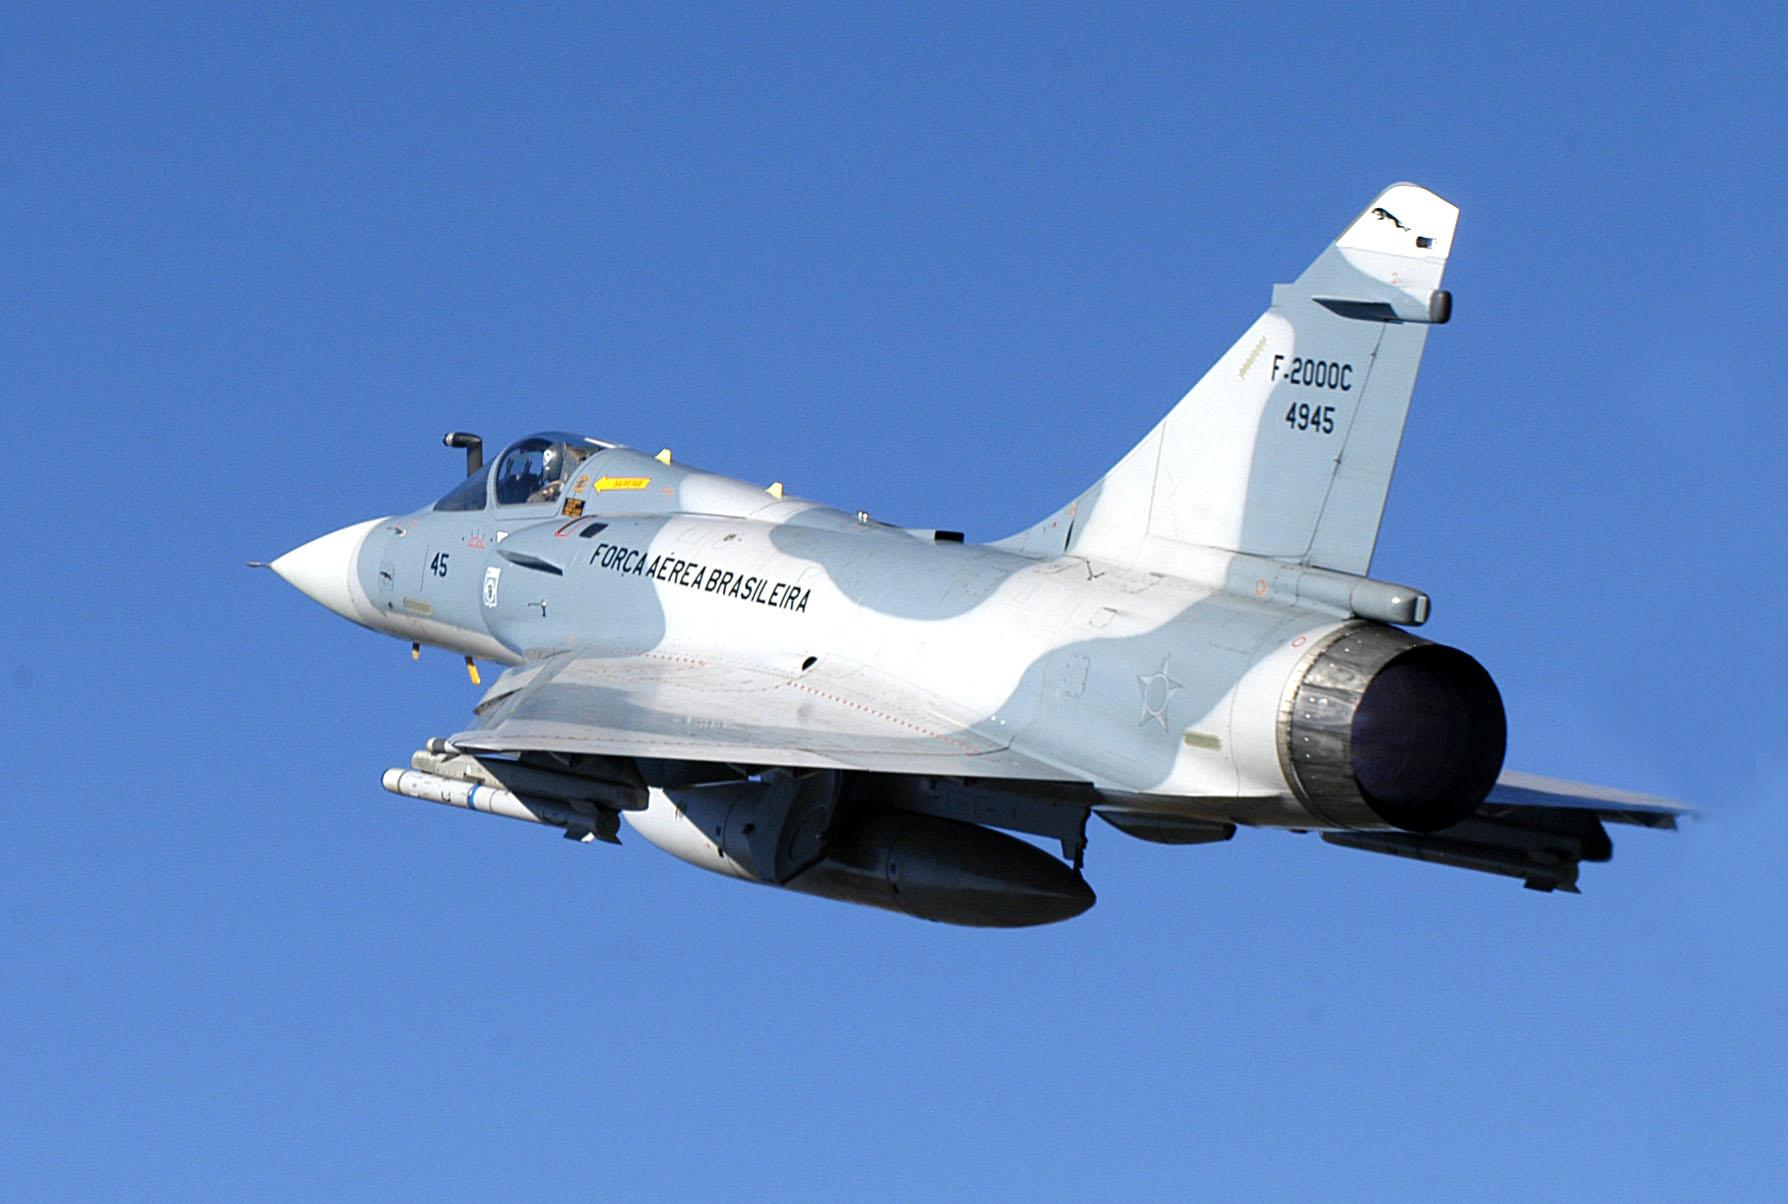 https://i2.wp.com/www.aereo.jor.br/wp-content/uploads/2010/04/FAB-Mirage-2000-Cb-Junior-2.jpg